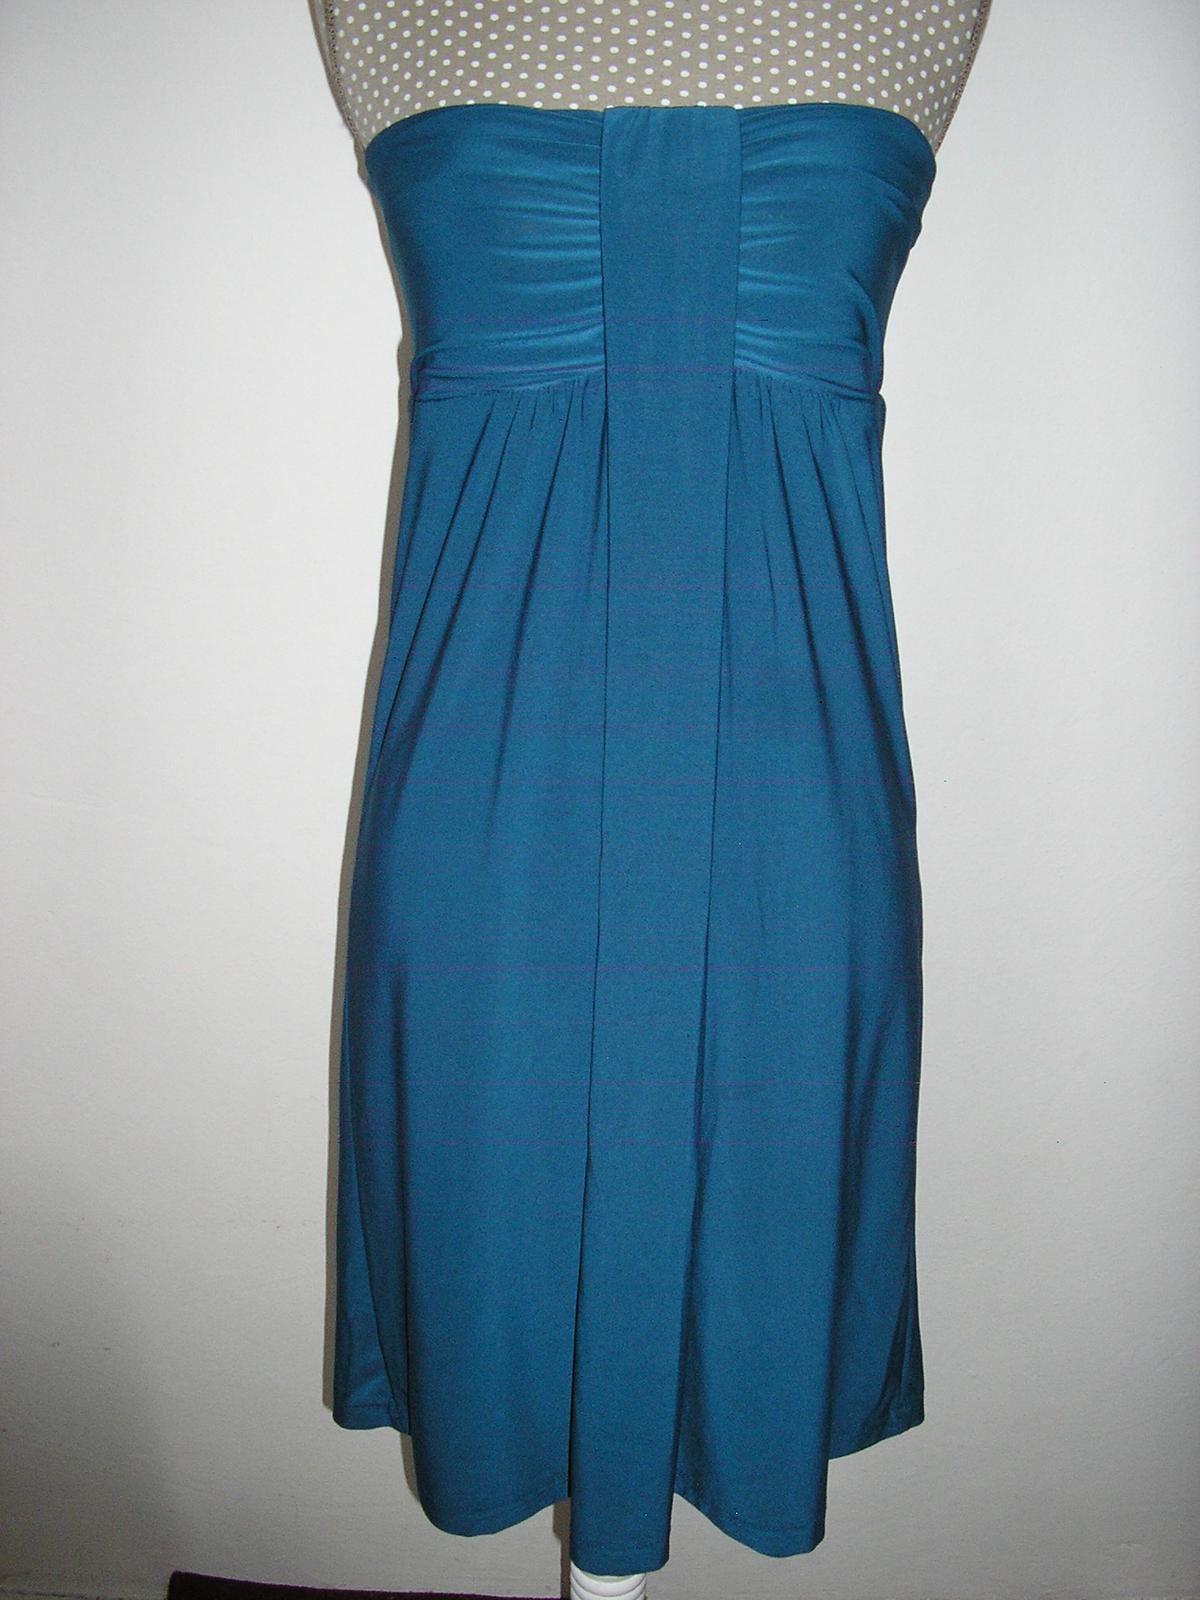 766. Lifeline šaty - Obrázok č. 1